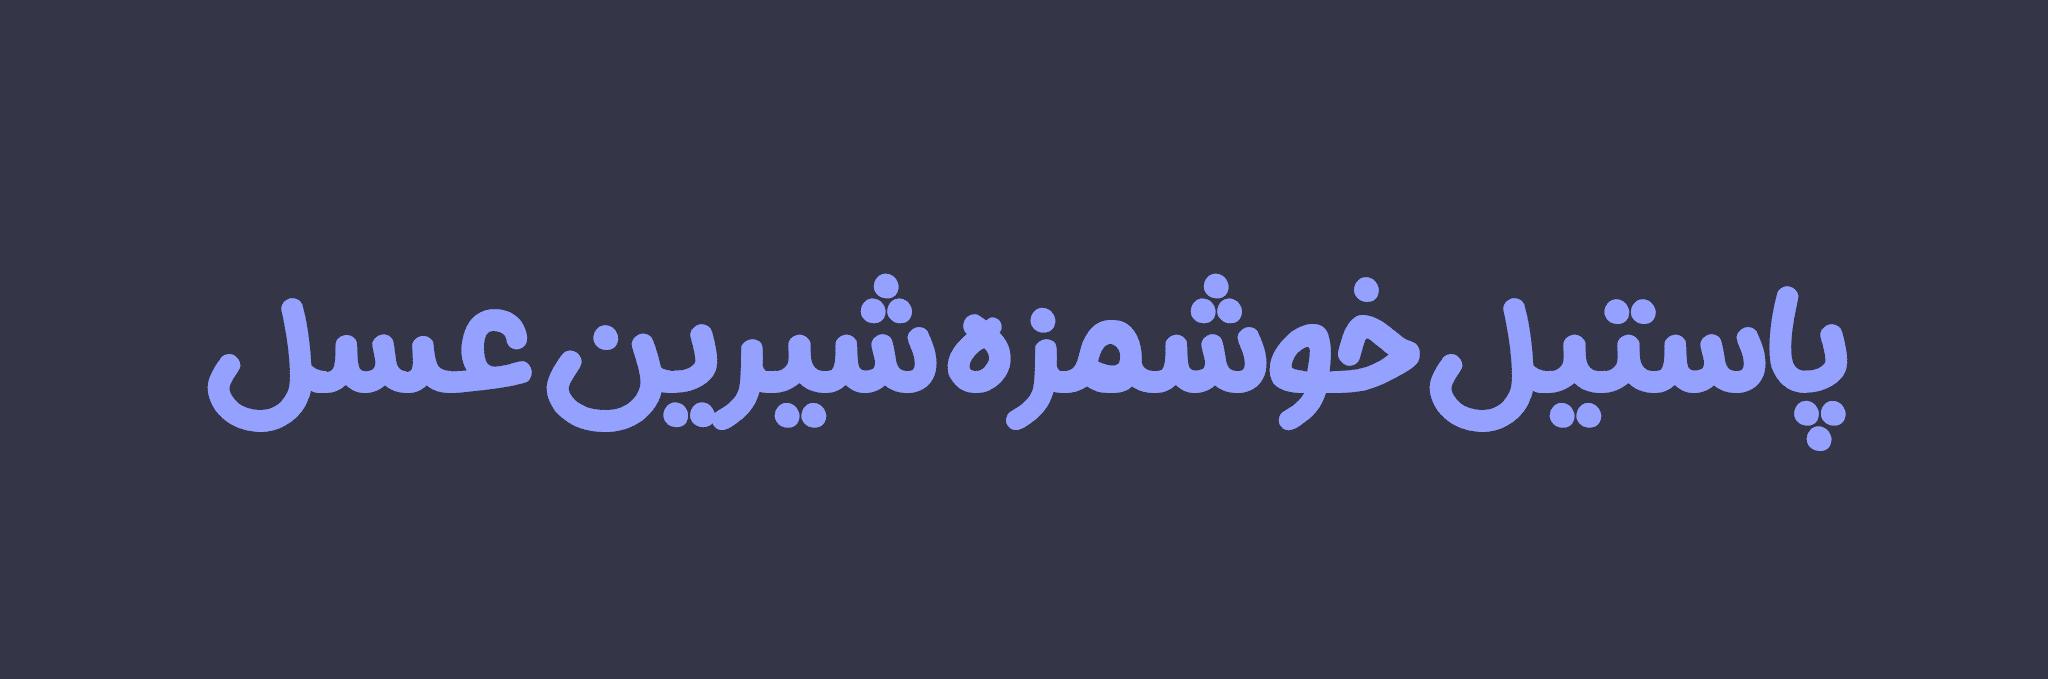 فونت فارسی پاستیل